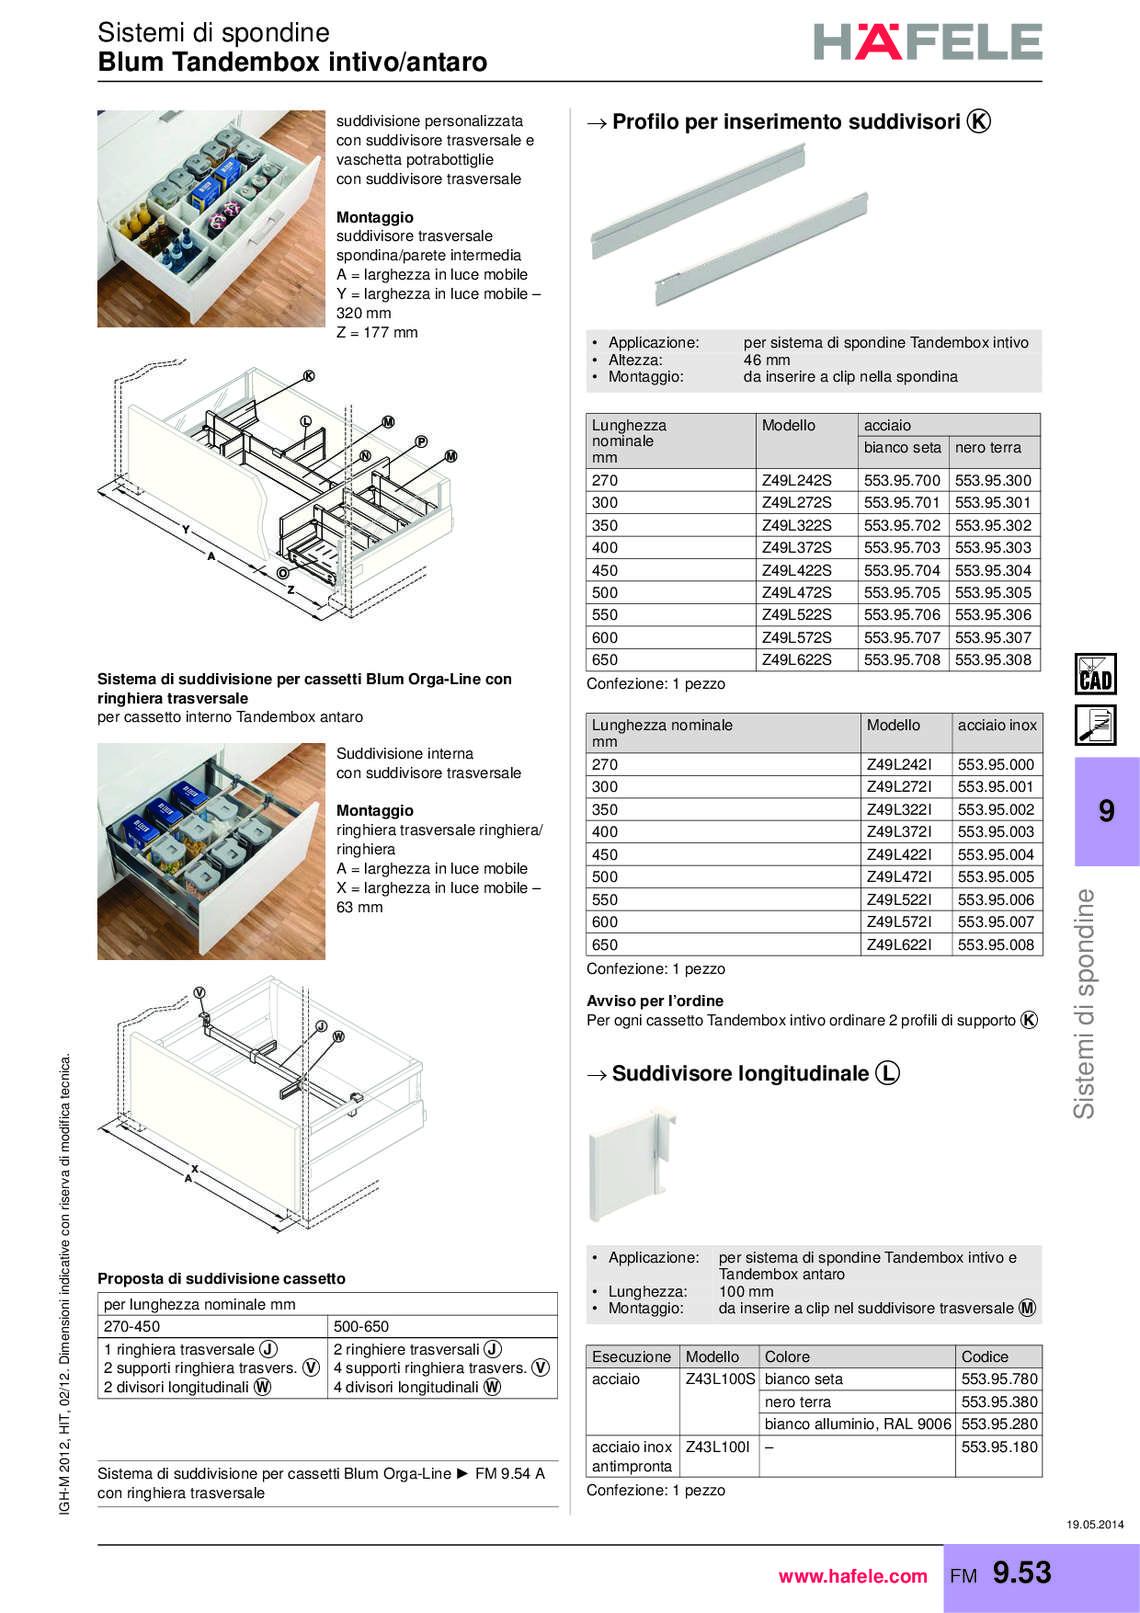 hafele-spondine-e-guide-per-mobili_40_064.jpg